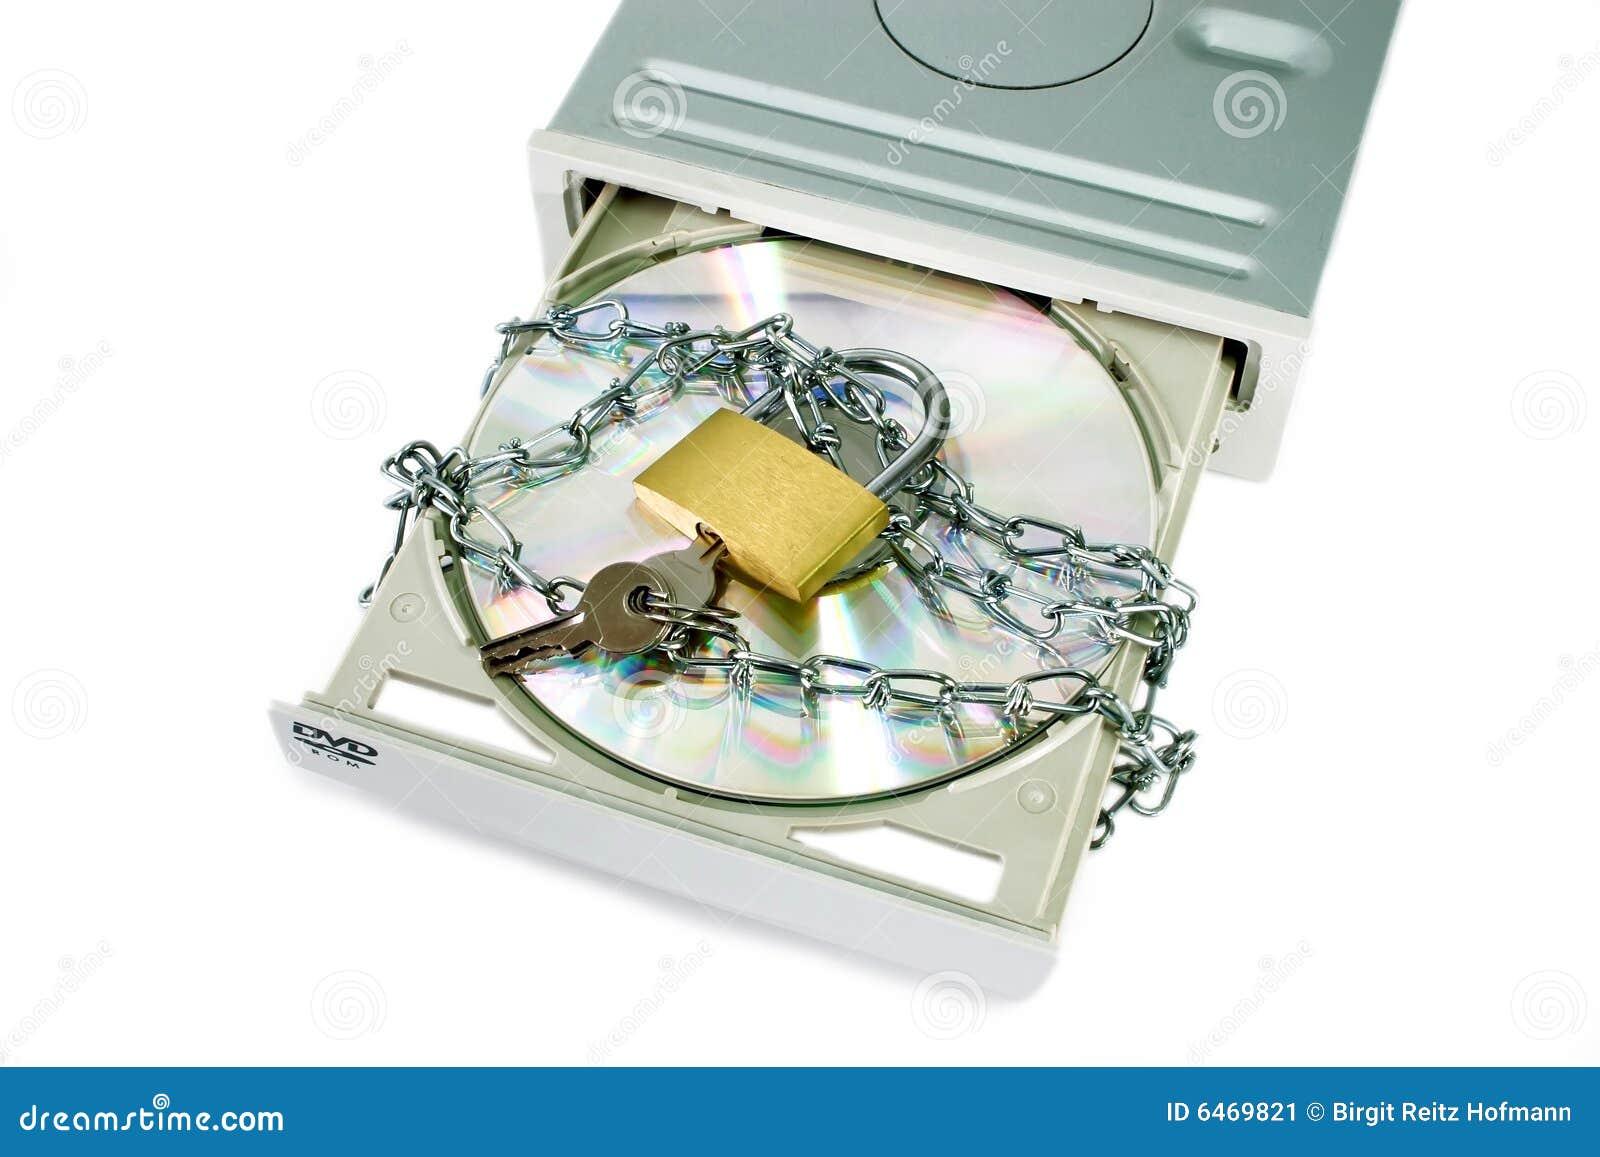 1 ochrony danych